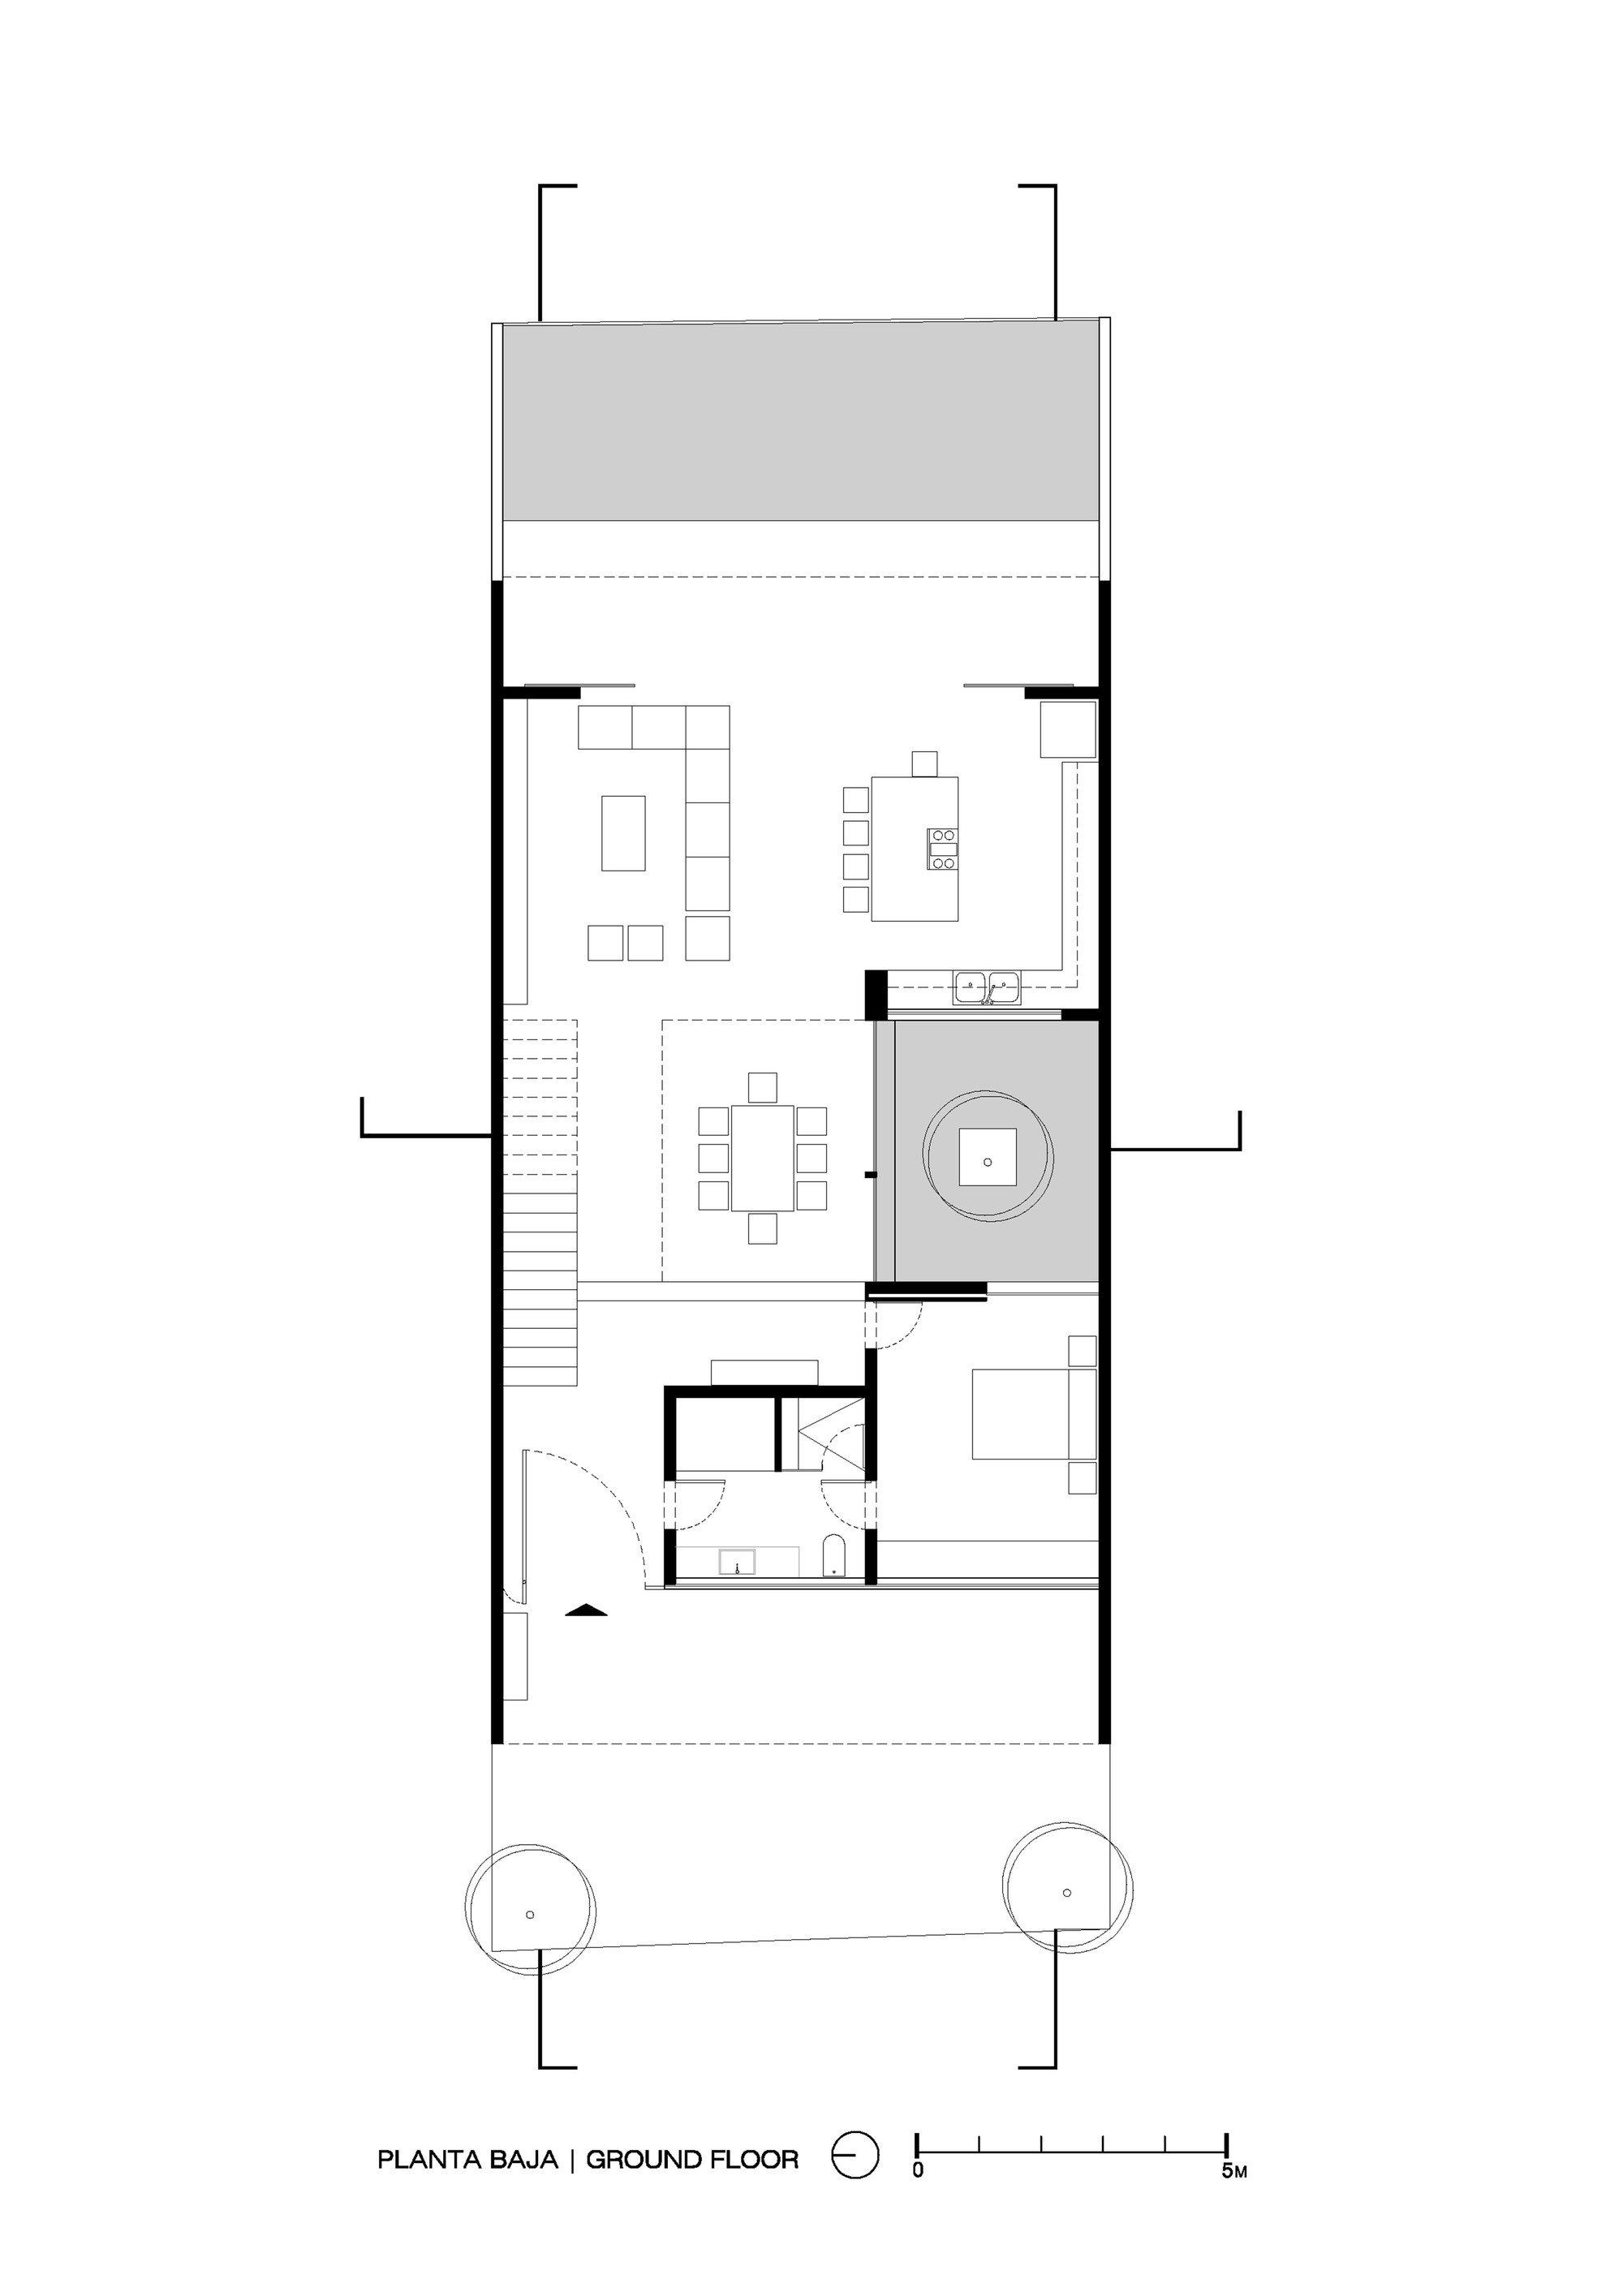 archidirectory2016